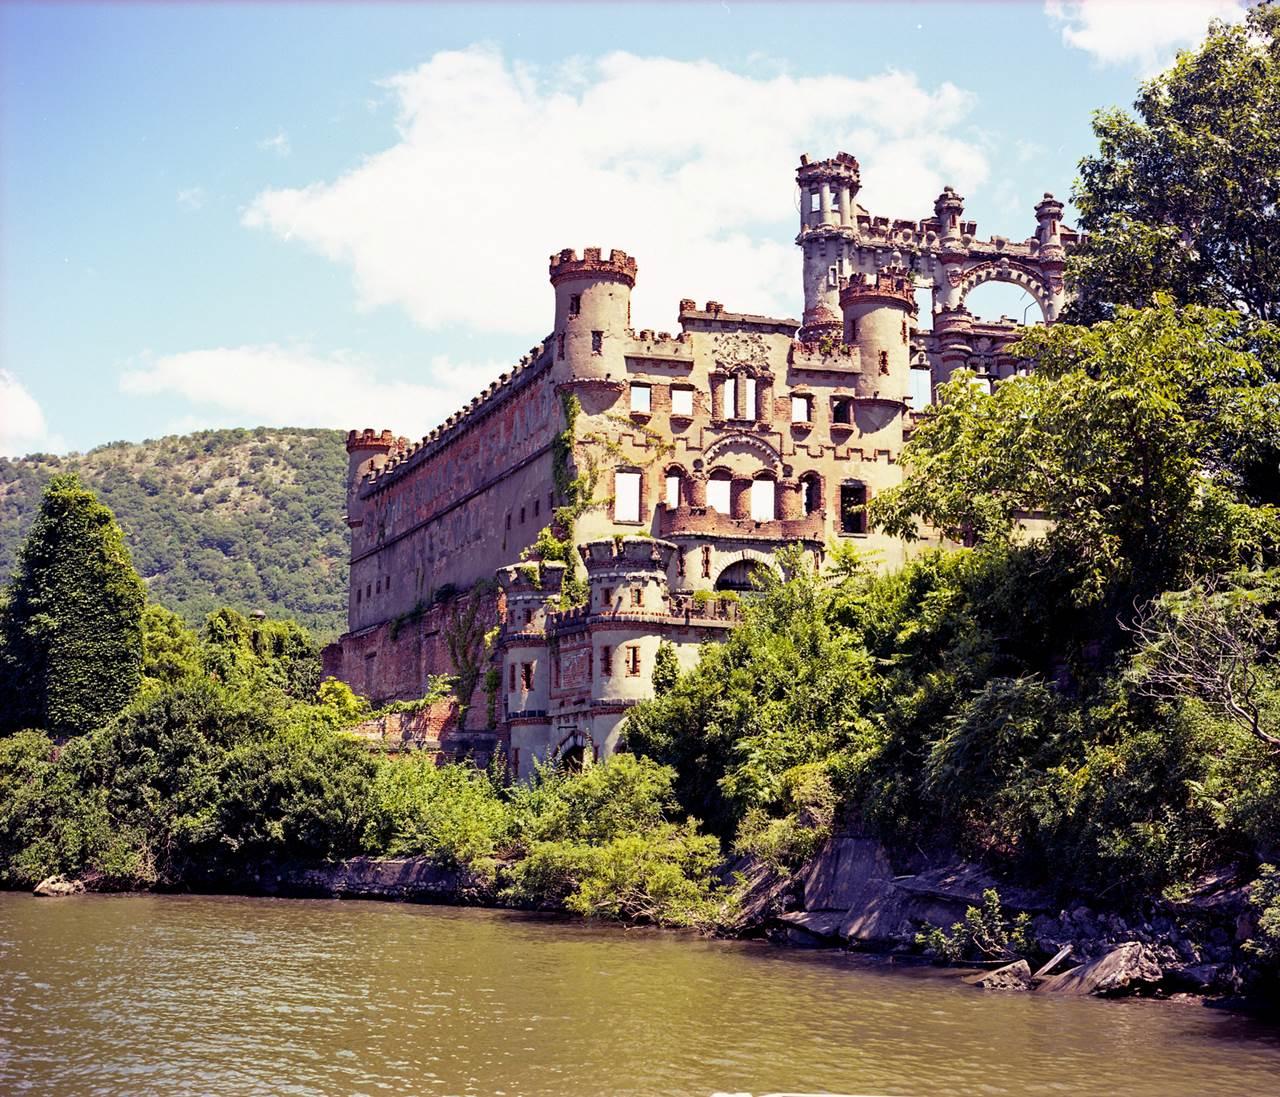 353531,xcitefun-bannerman-castle-1.jpg